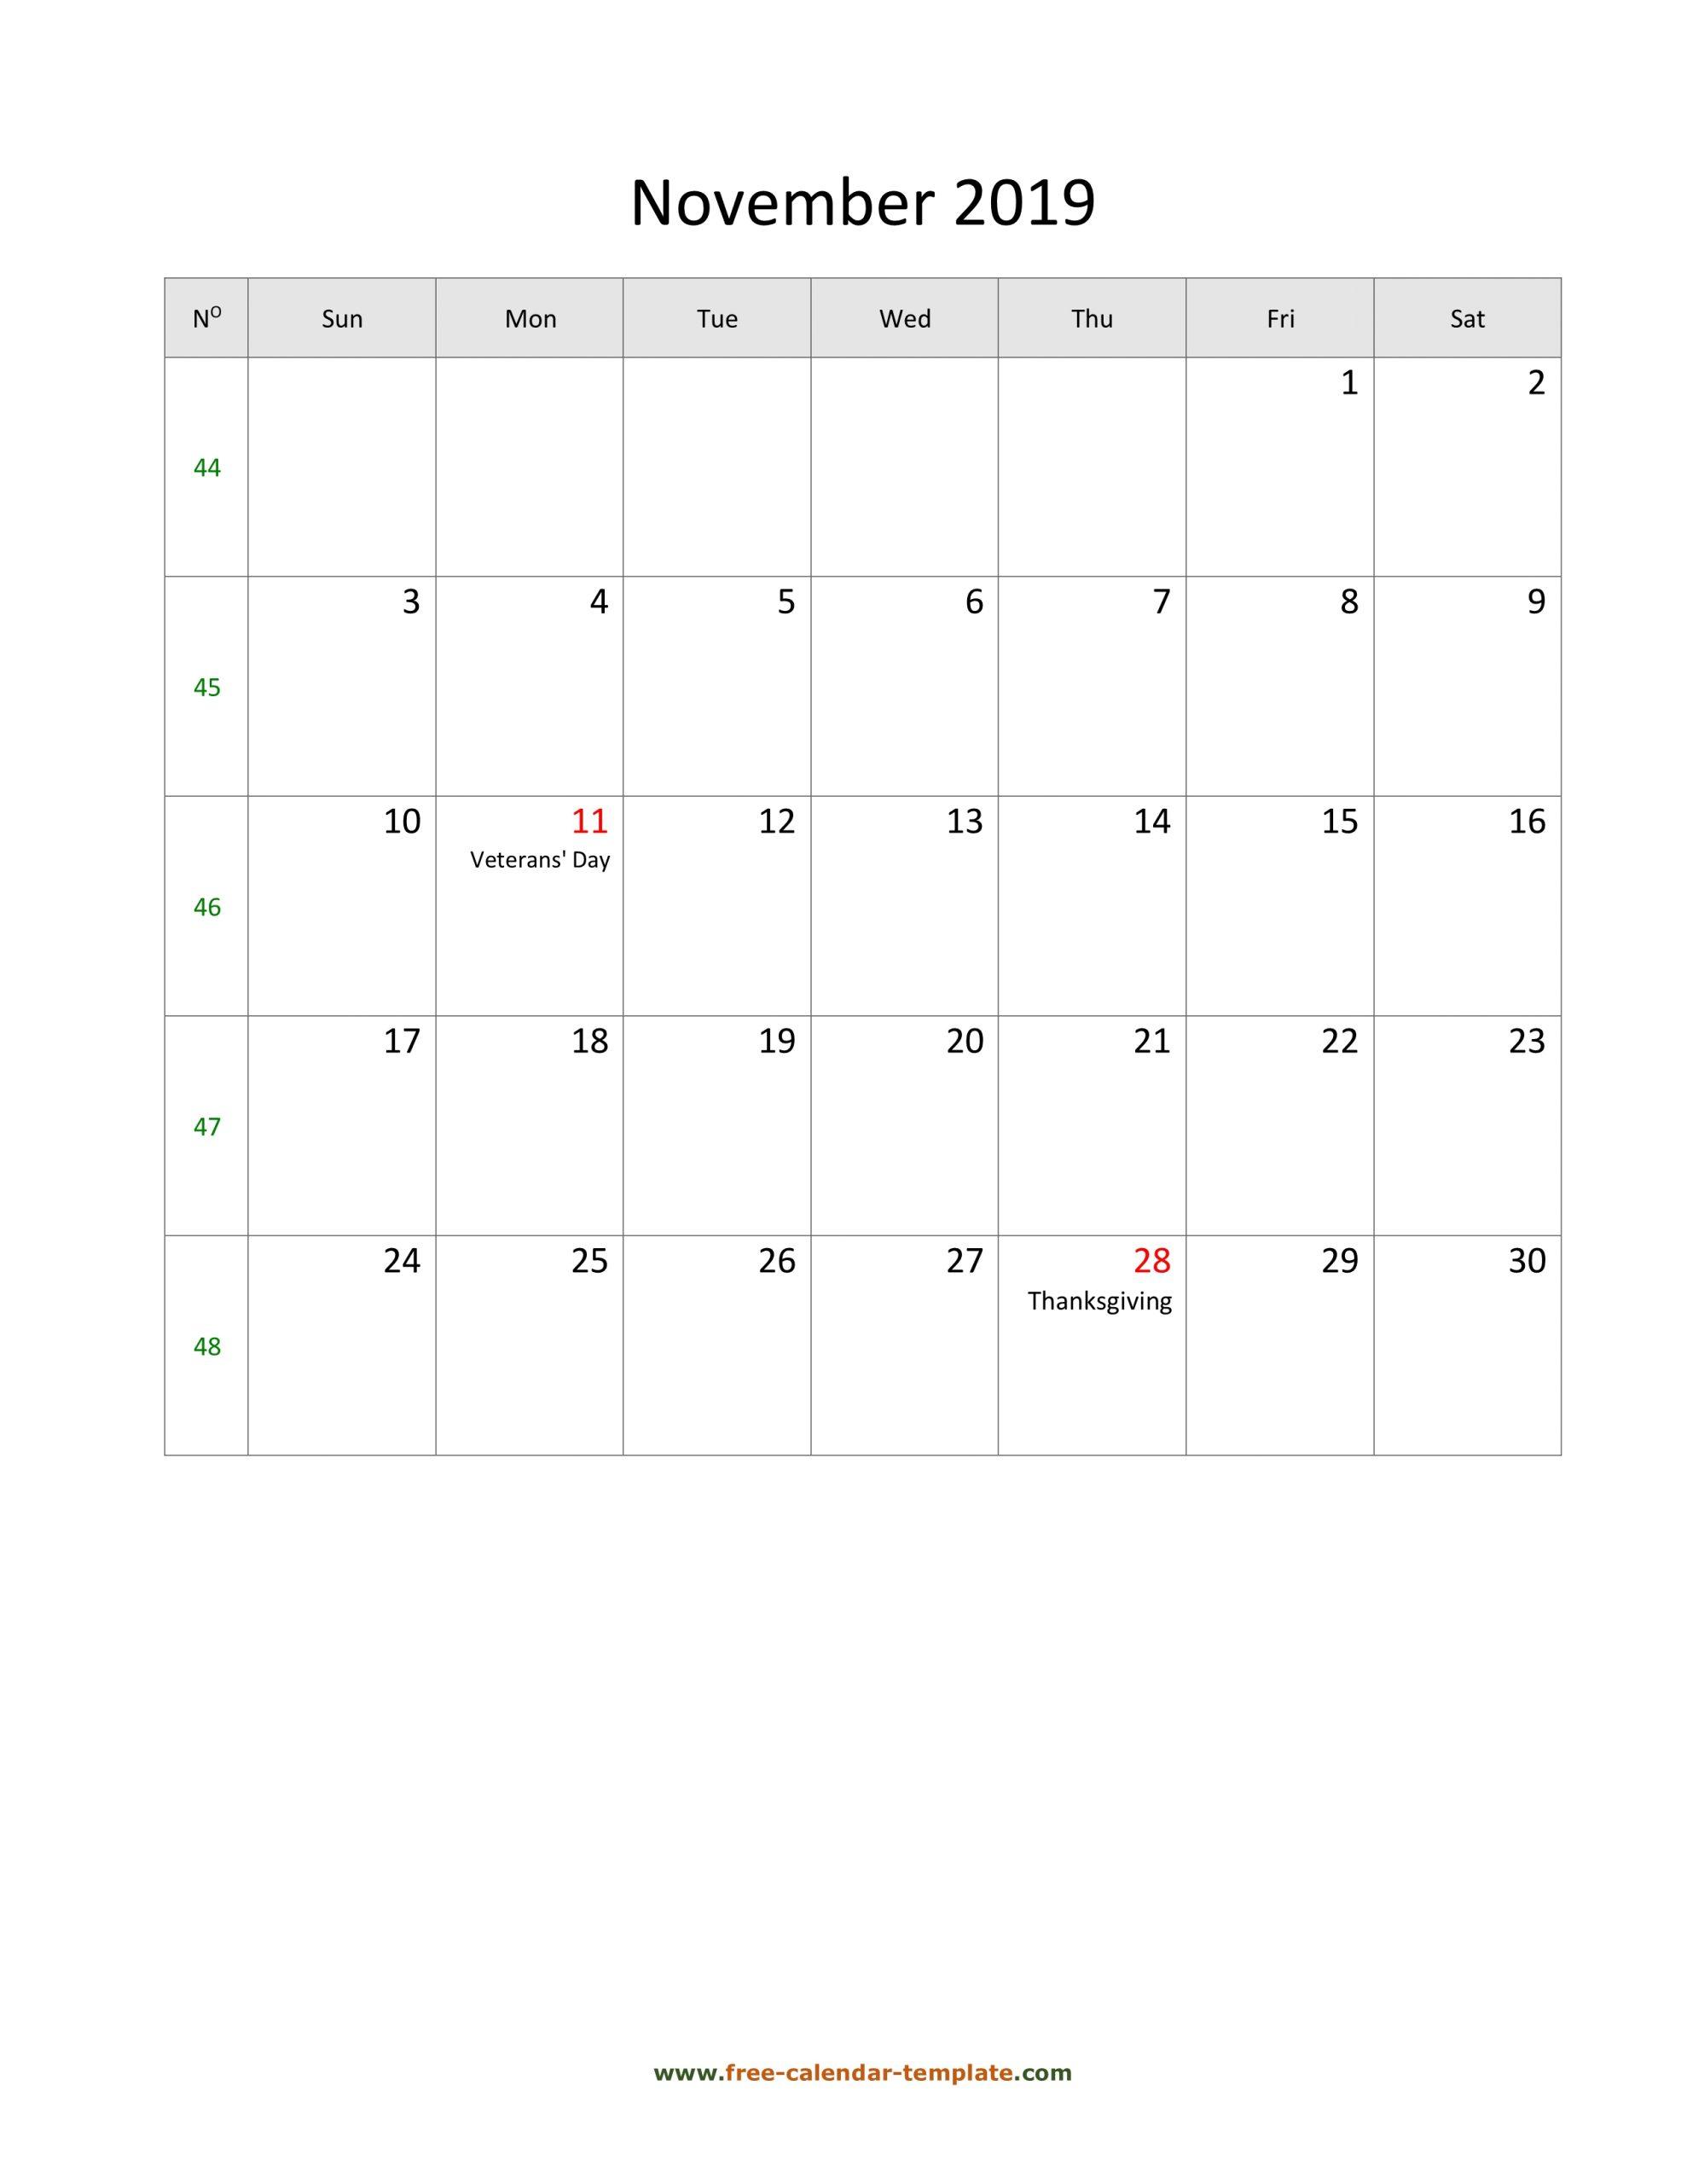 2019 November Calendar (Blank Vertical Template) | Free